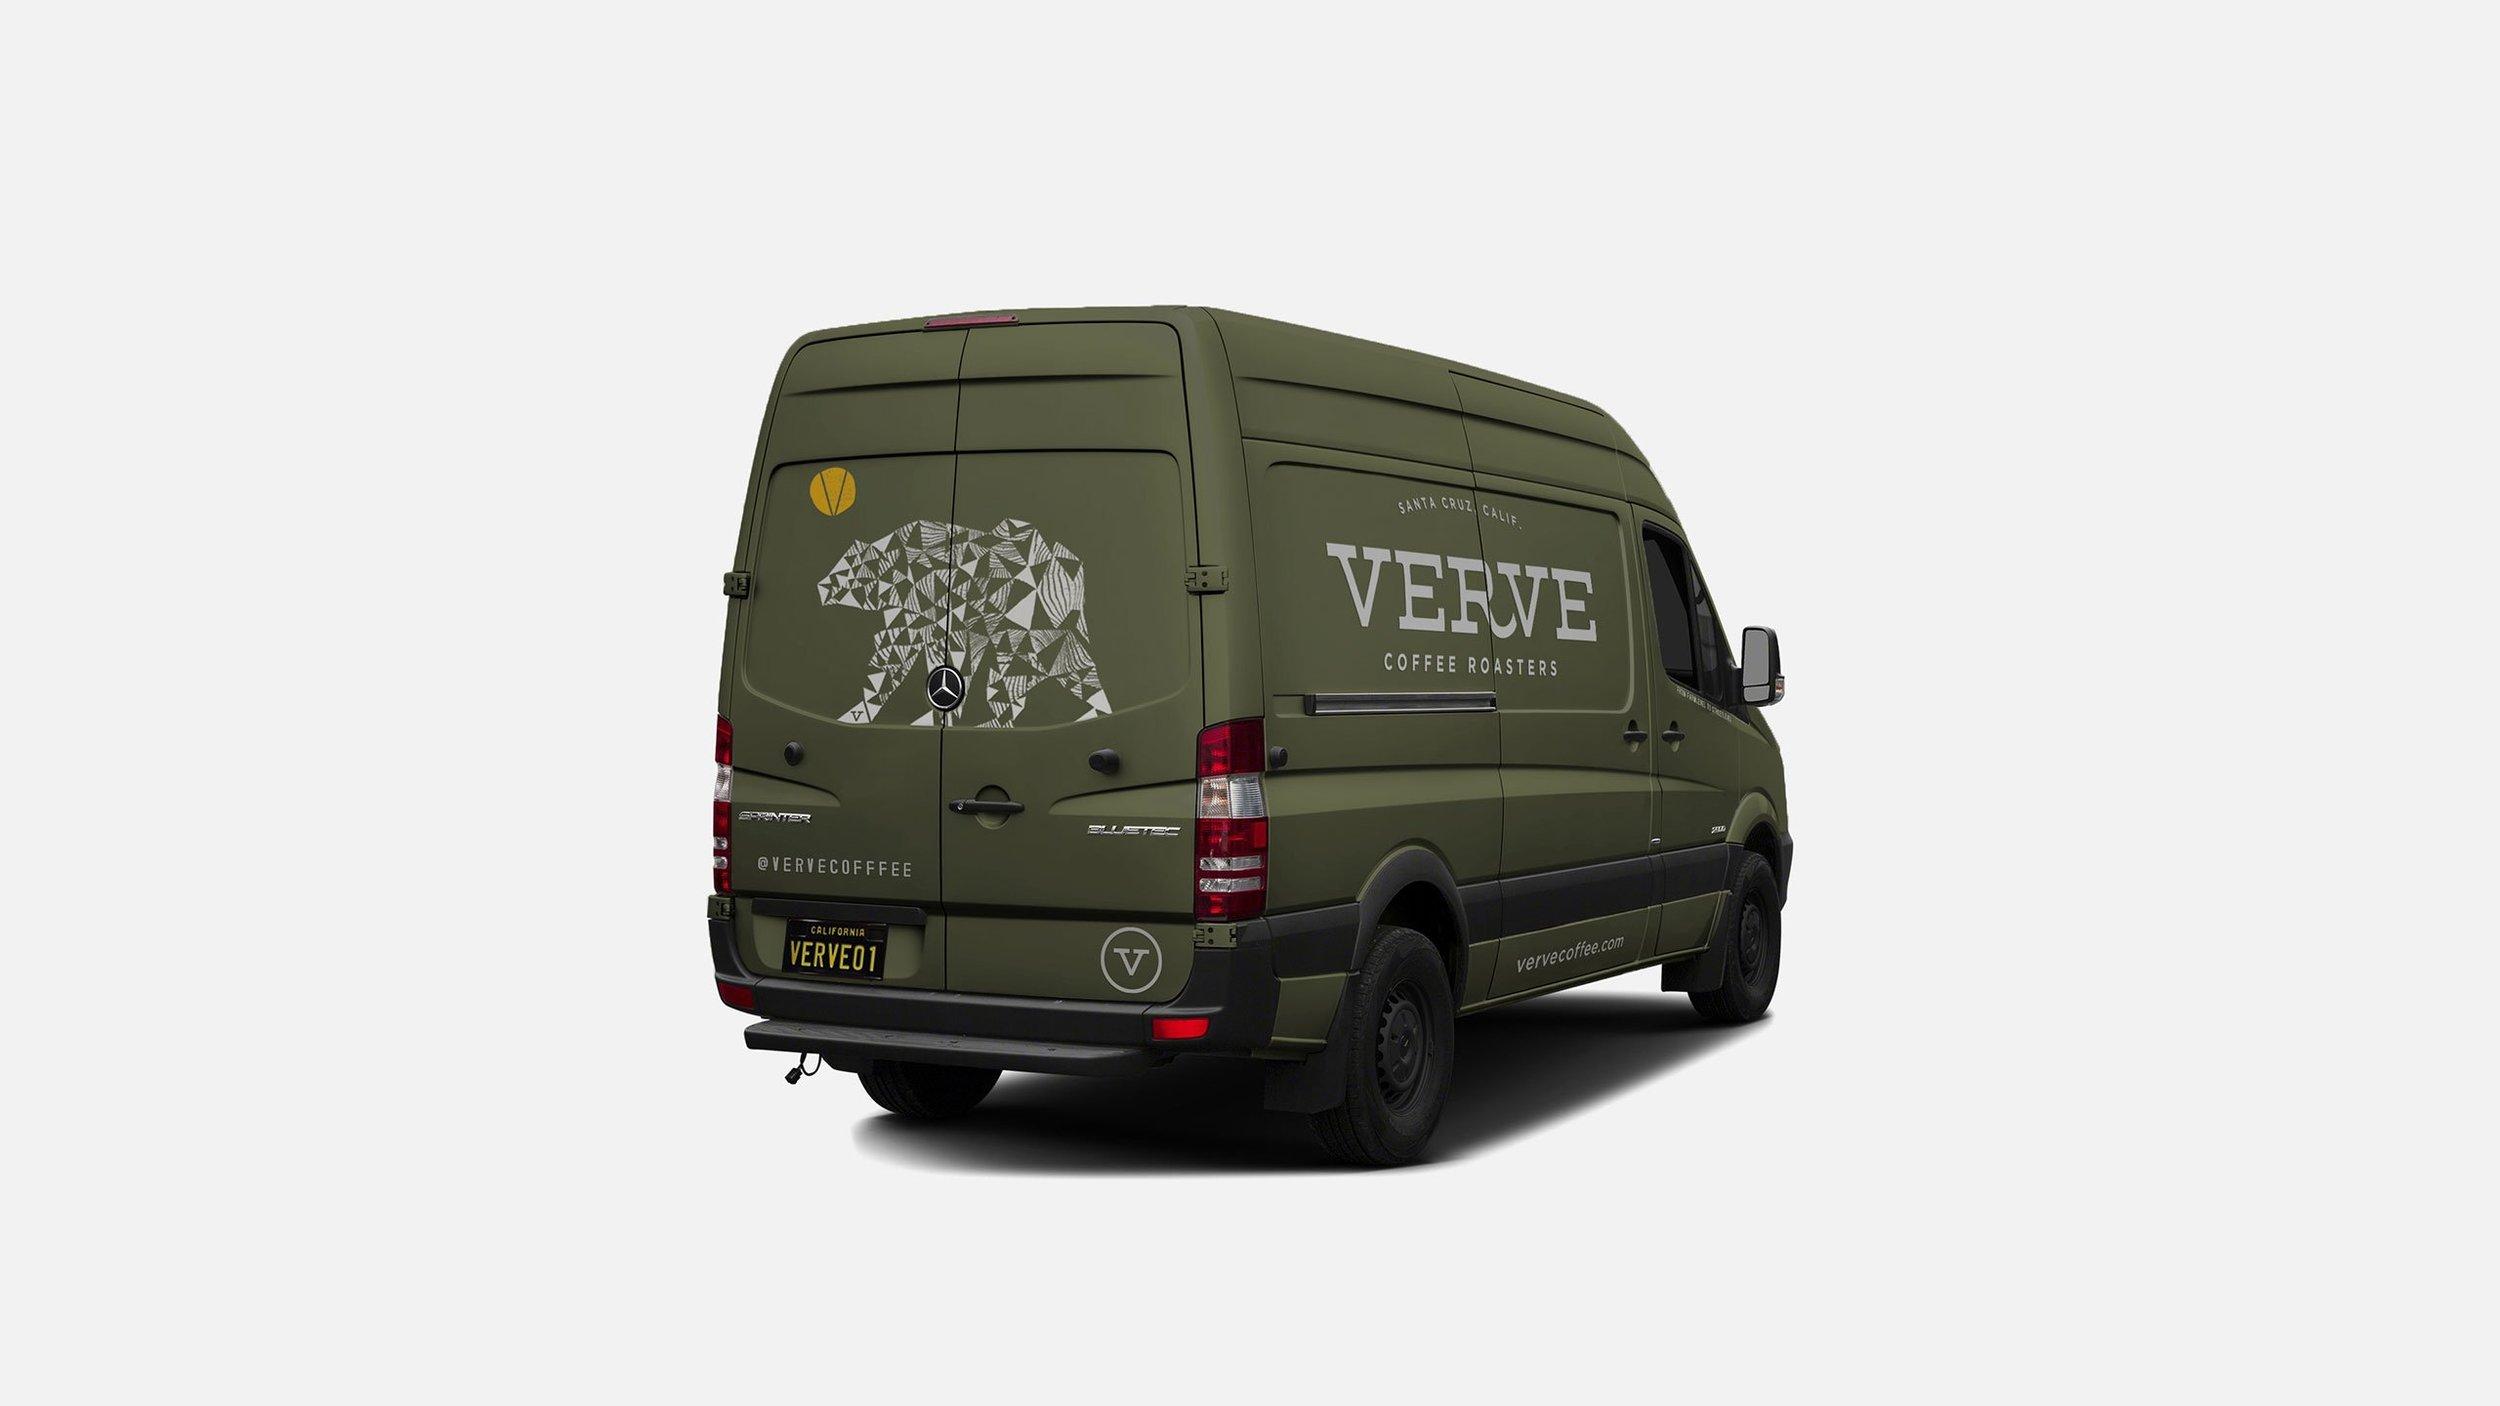 Verve-Van-Colony-2.jpg